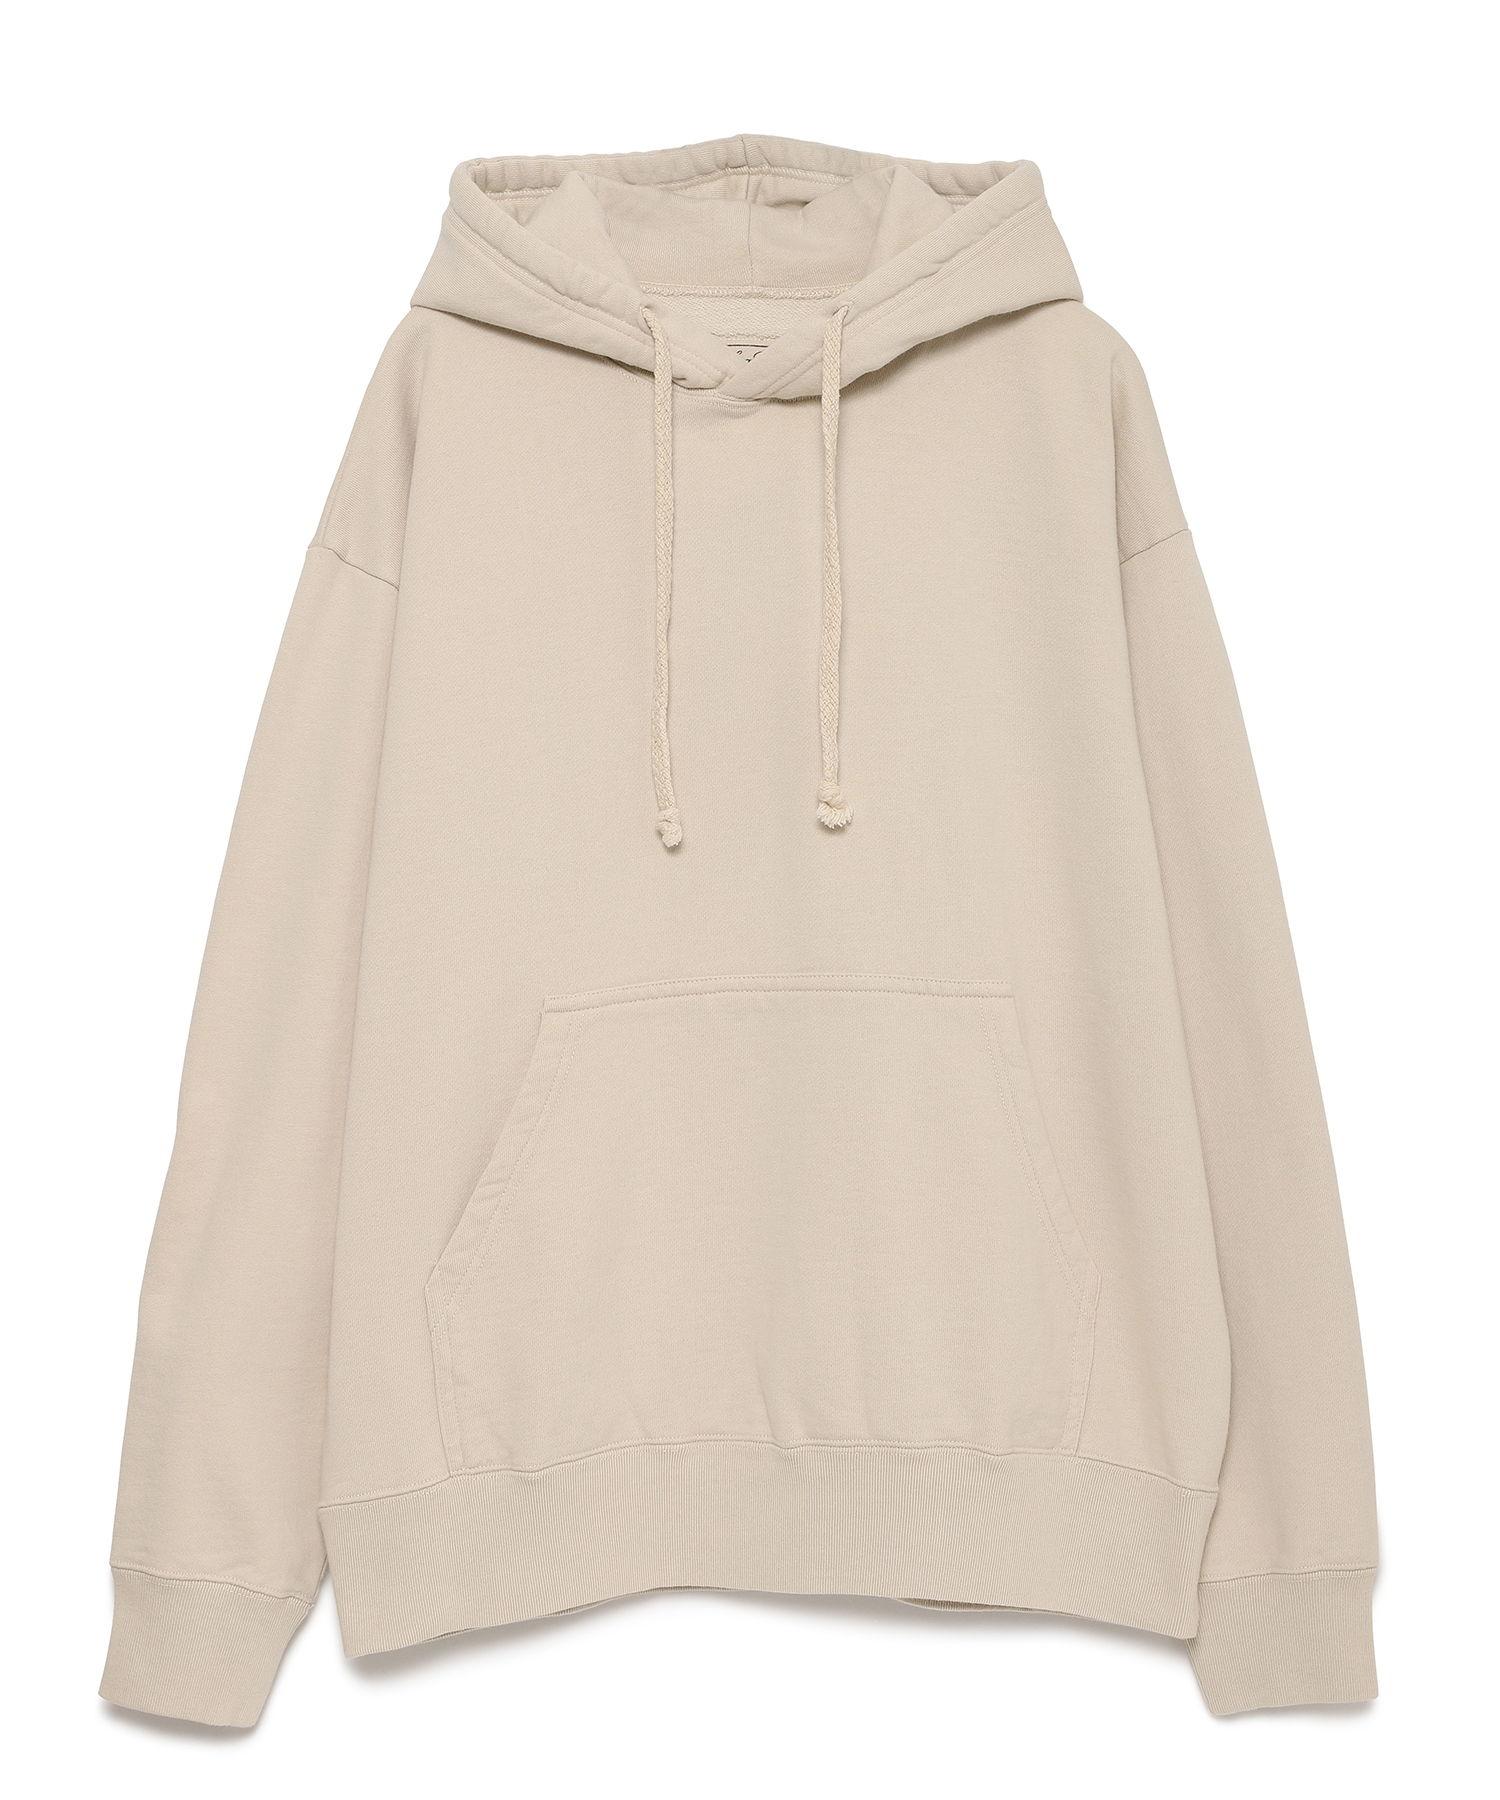 Seagreen COTTON FLEECY hoodie